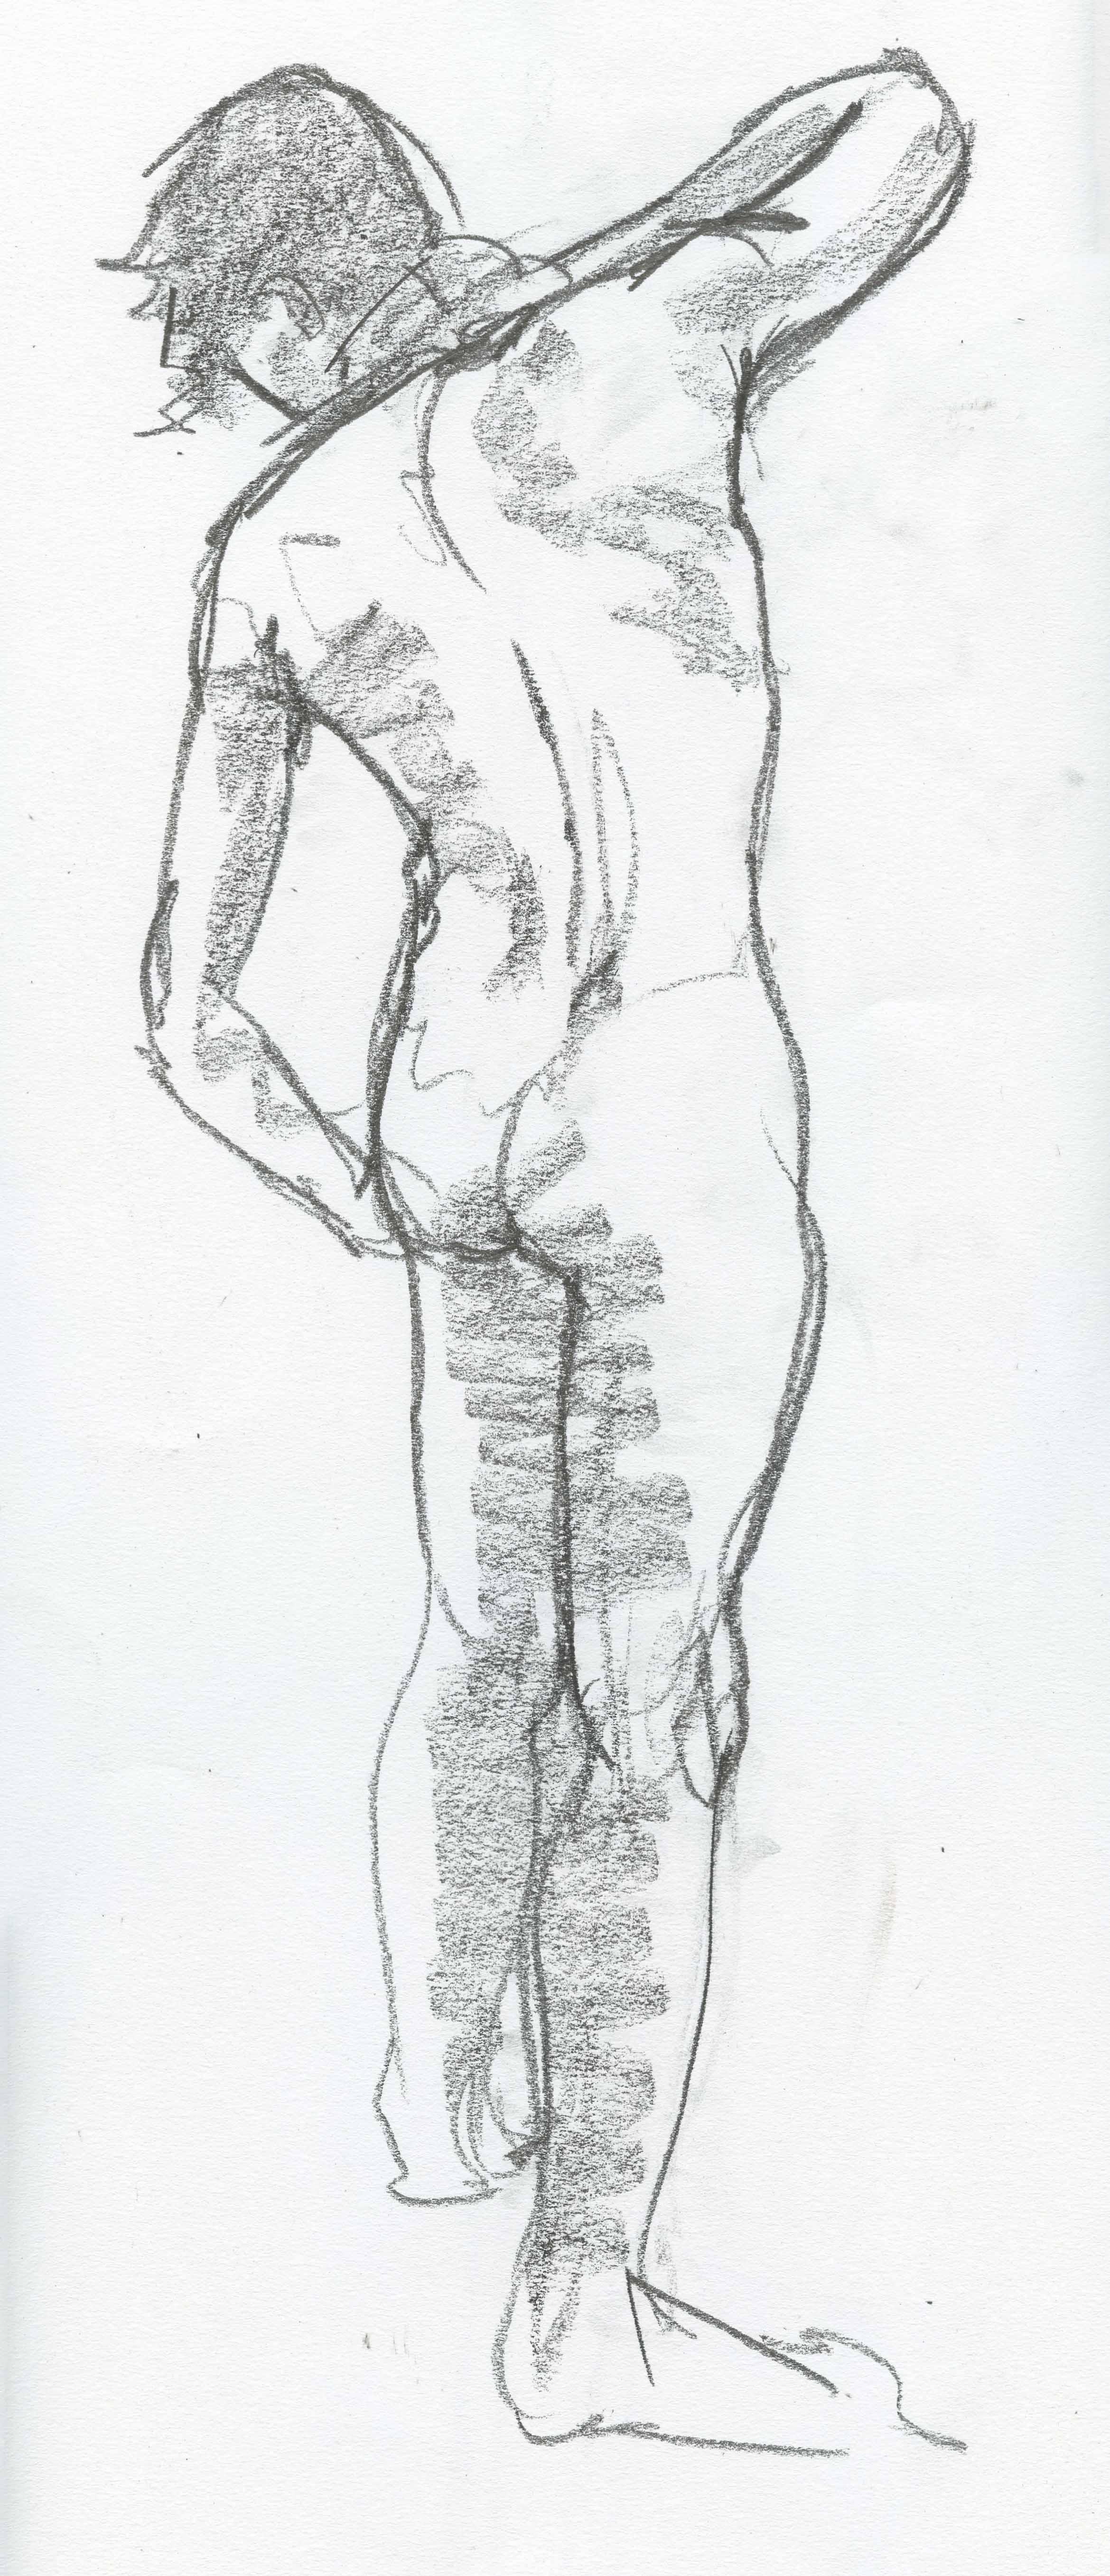 Noomis - Etudes, croquis & Wip [ Nudité ] - Page 6 160927110646236055